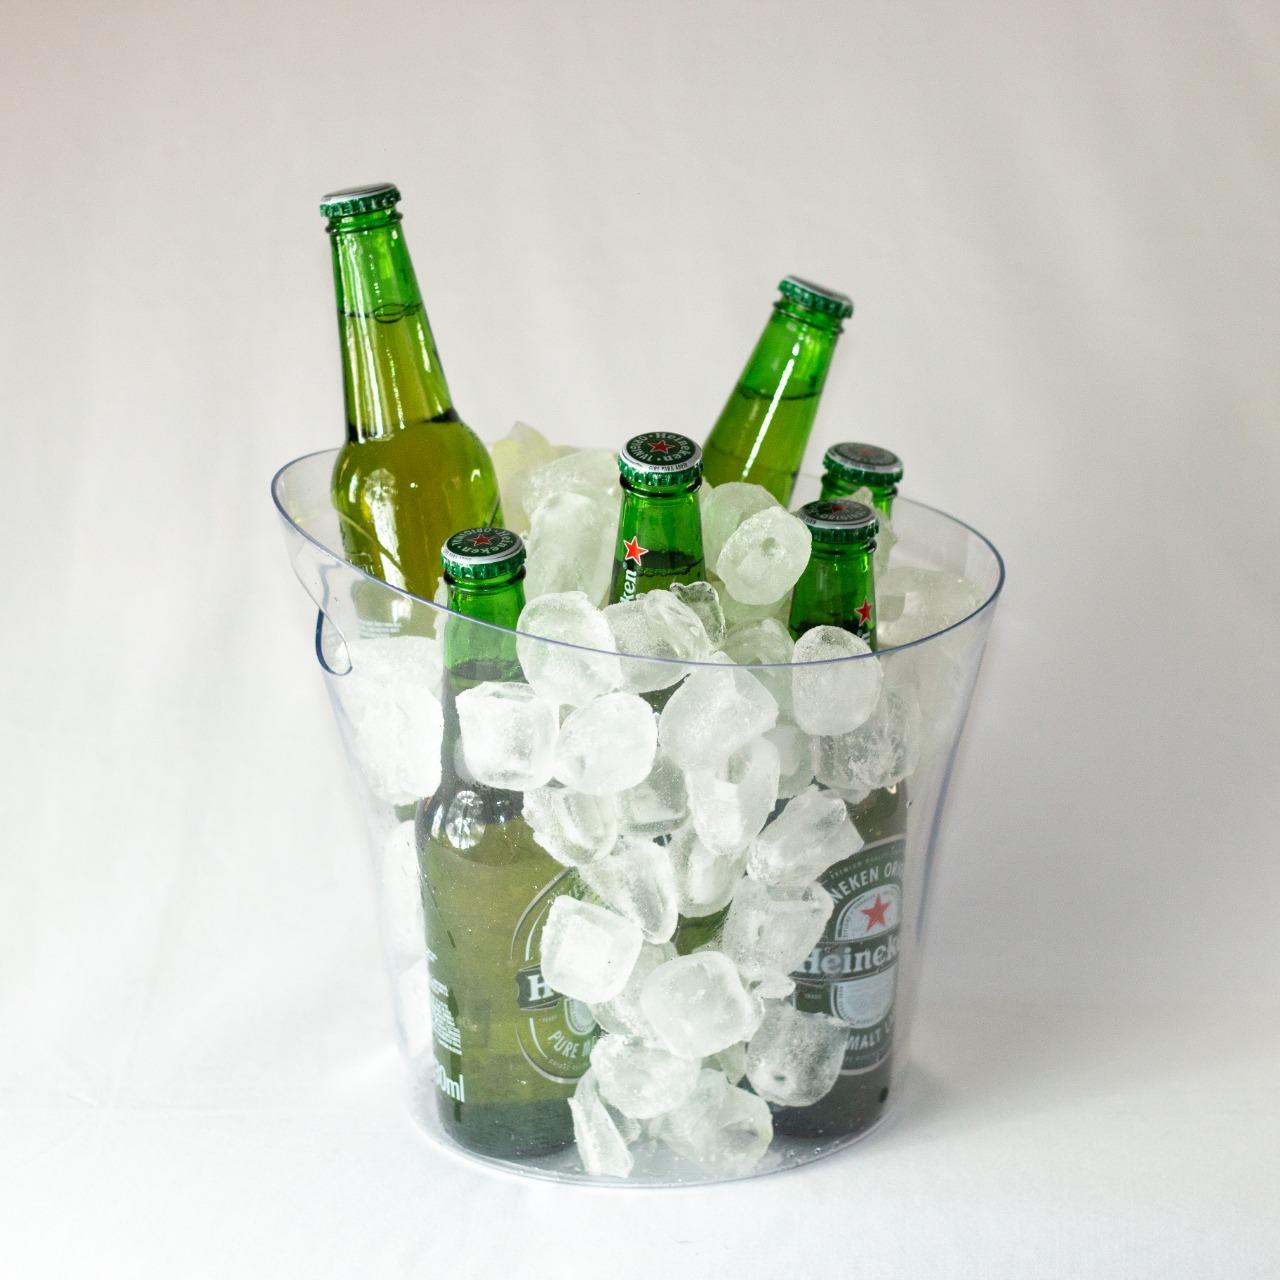 6 Baldes de Gelo 4,5 L para Cerveja Baldinhos Gelo + 2 Copos Long Drink